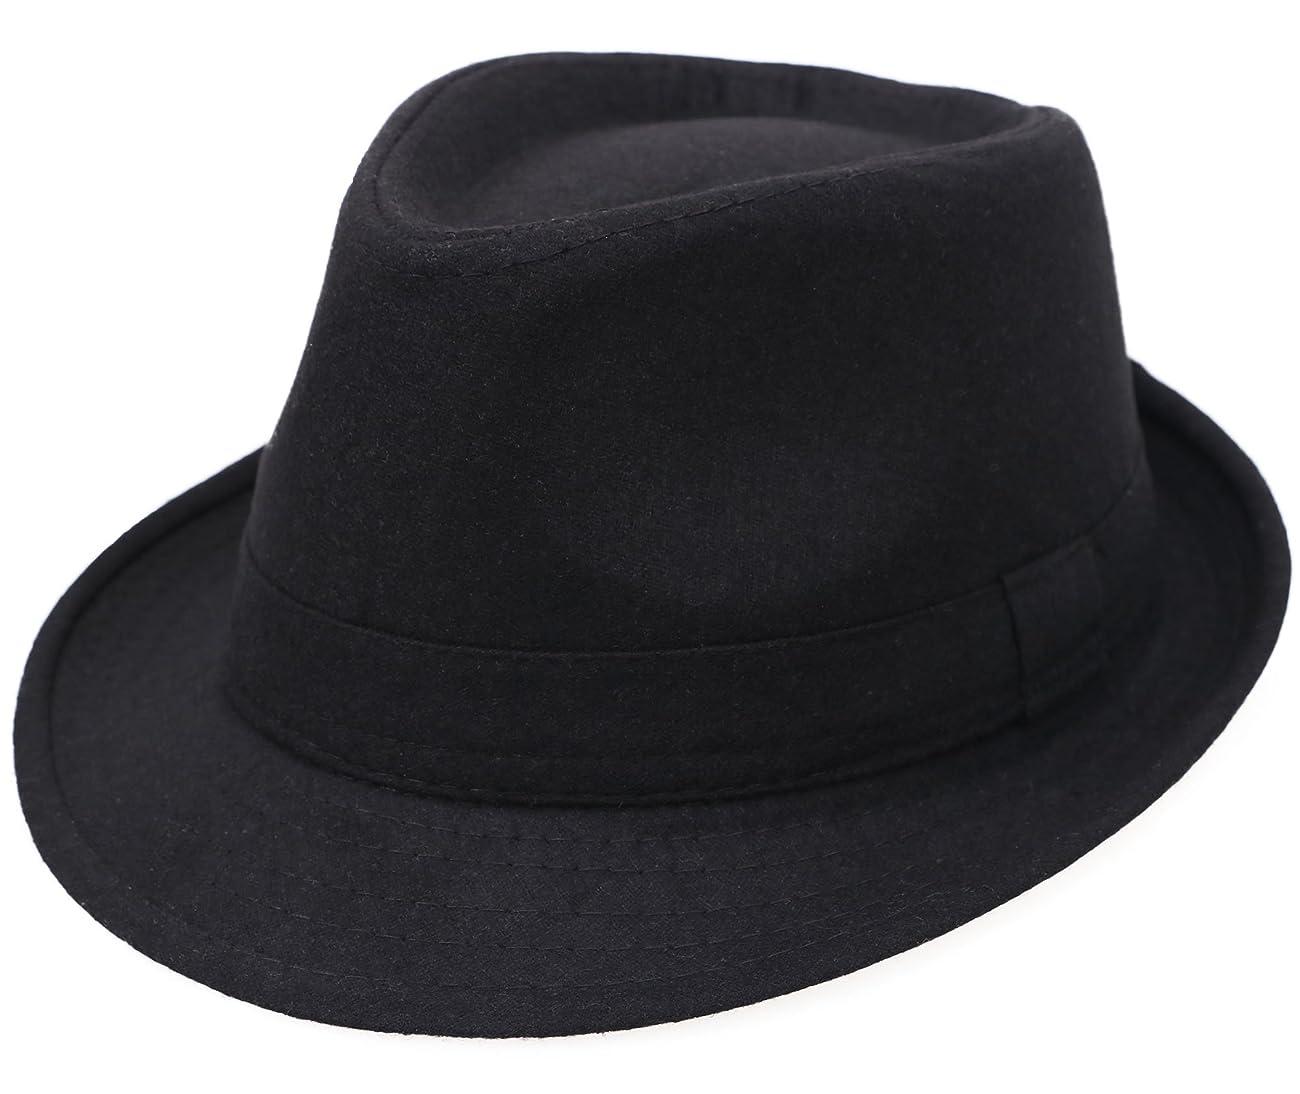 Simplicity Women Men's Fashion Fall / Winter Dapper Fedora Hat w/ Wide Brim 0